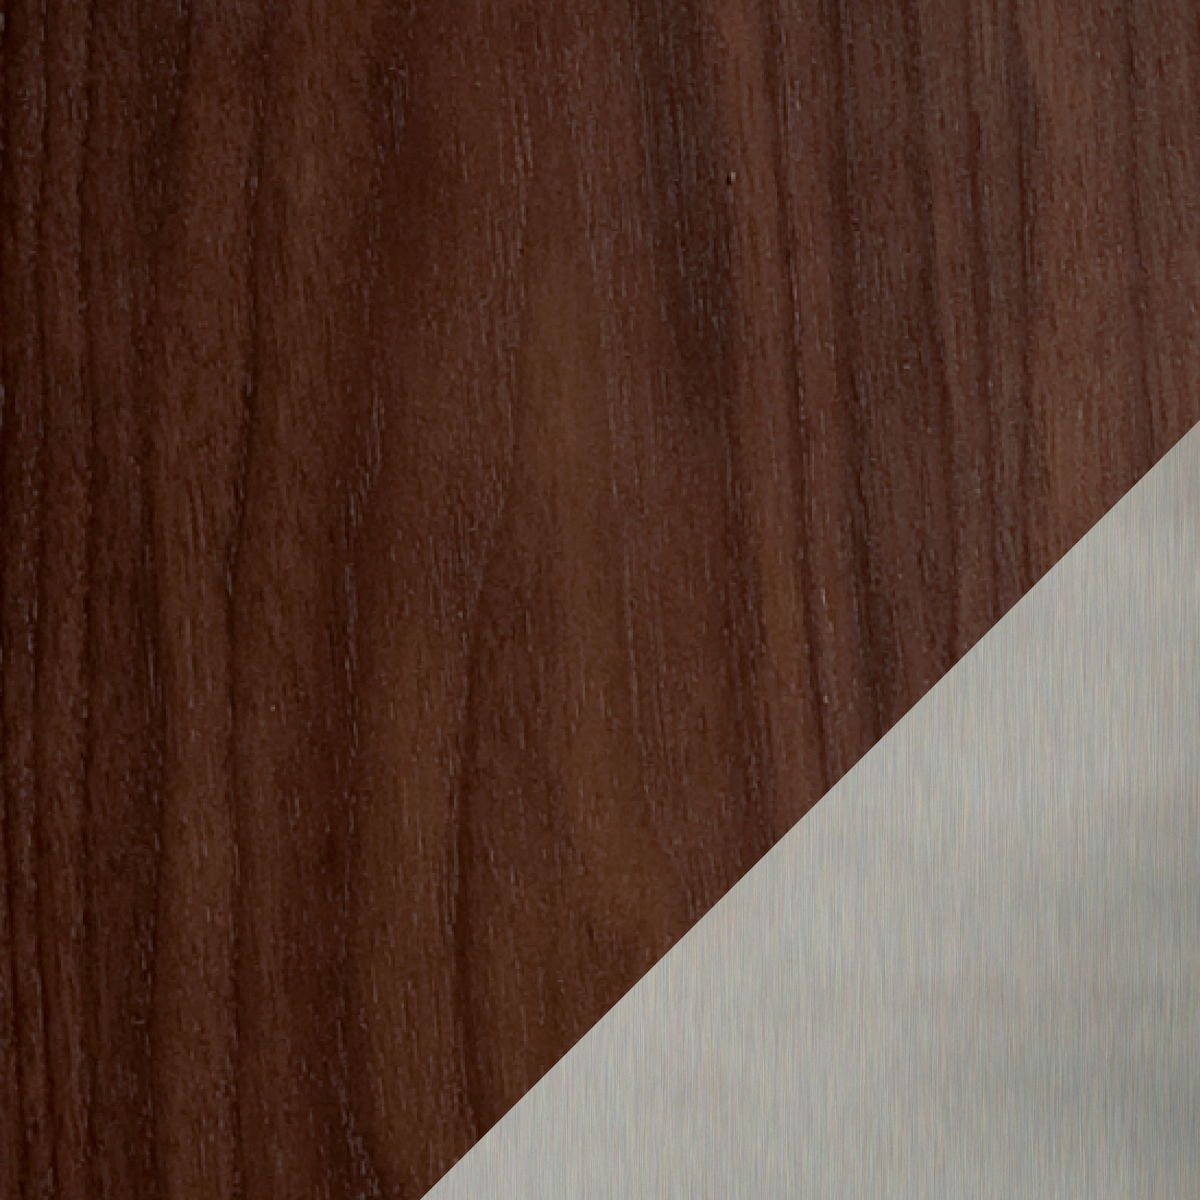 Chocolate Walnut / Satin Nickel